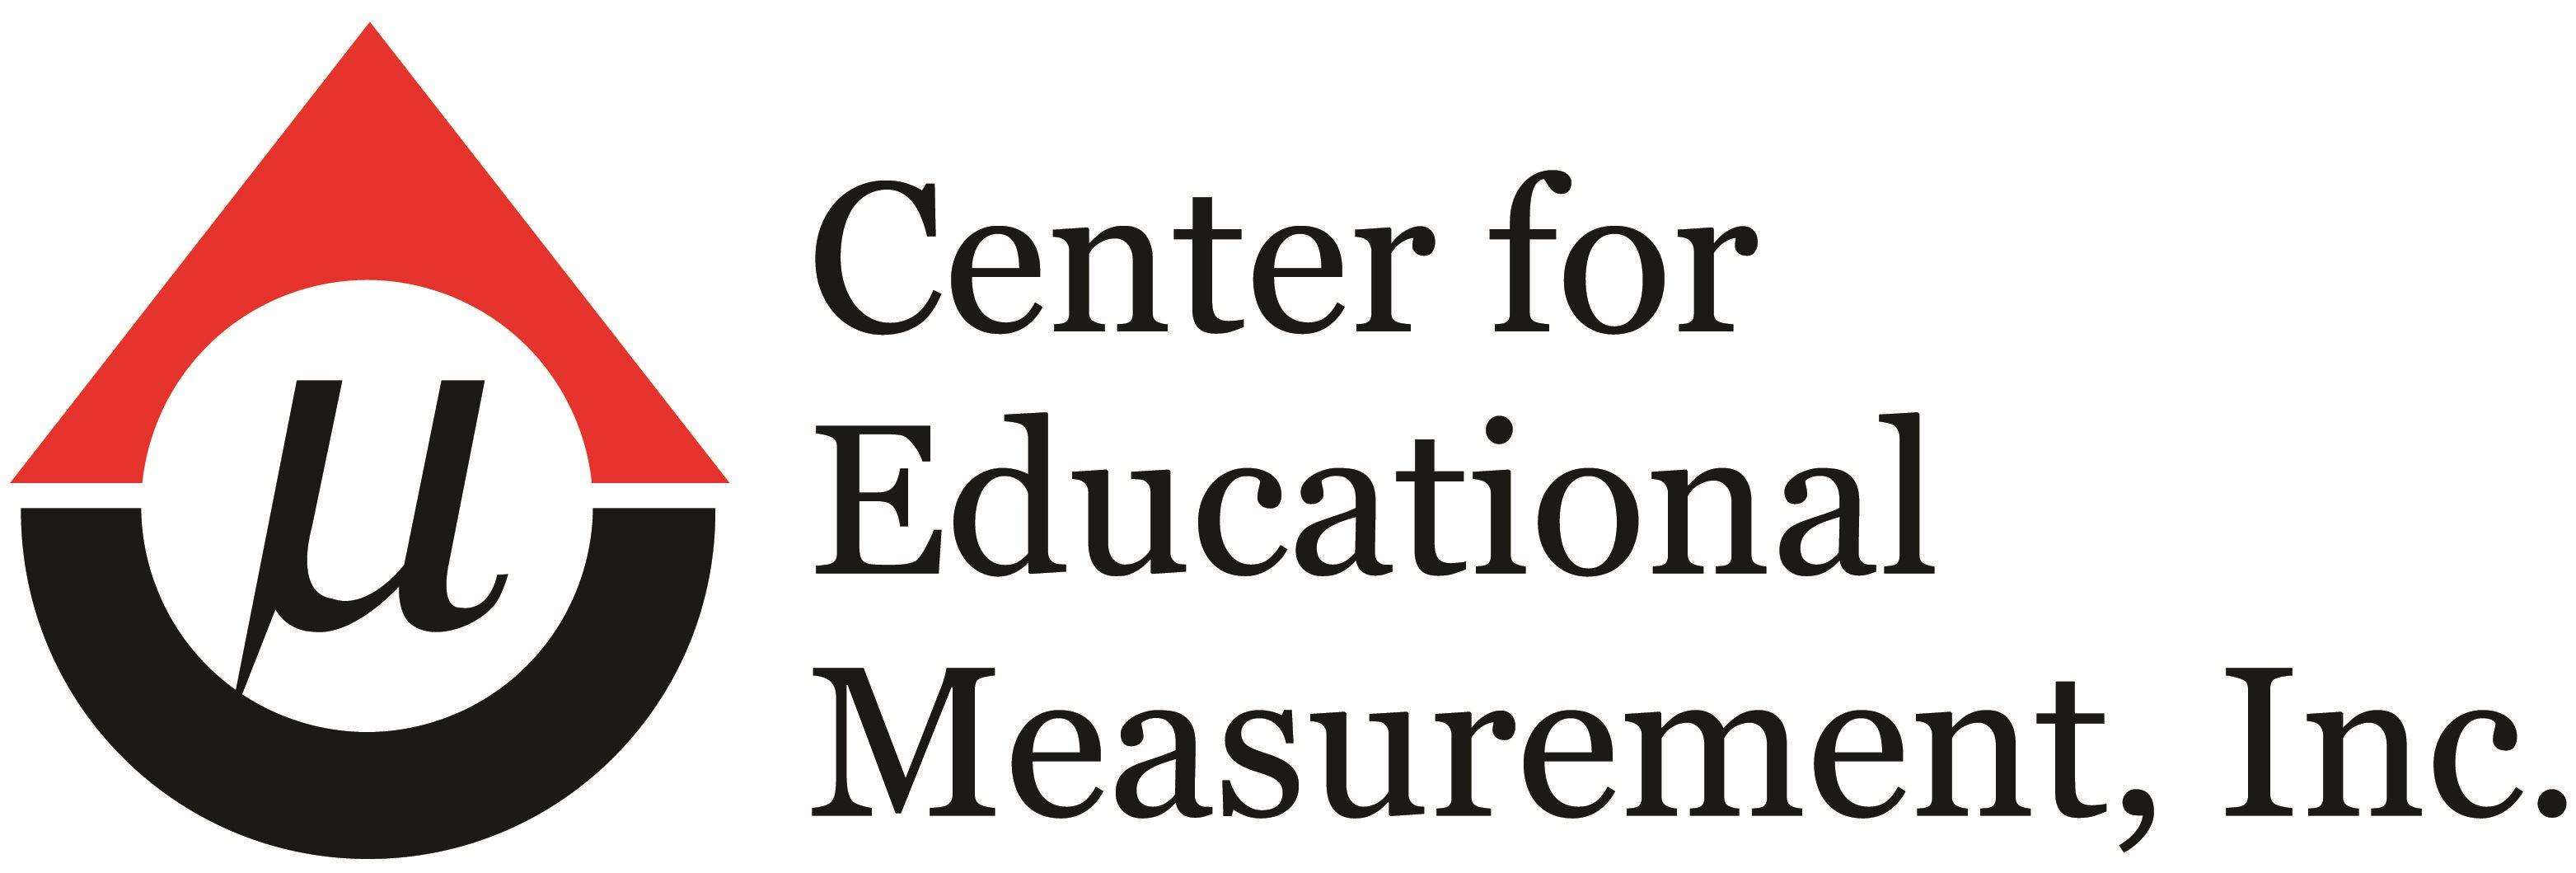 Center for Educational Measurement, Inc.